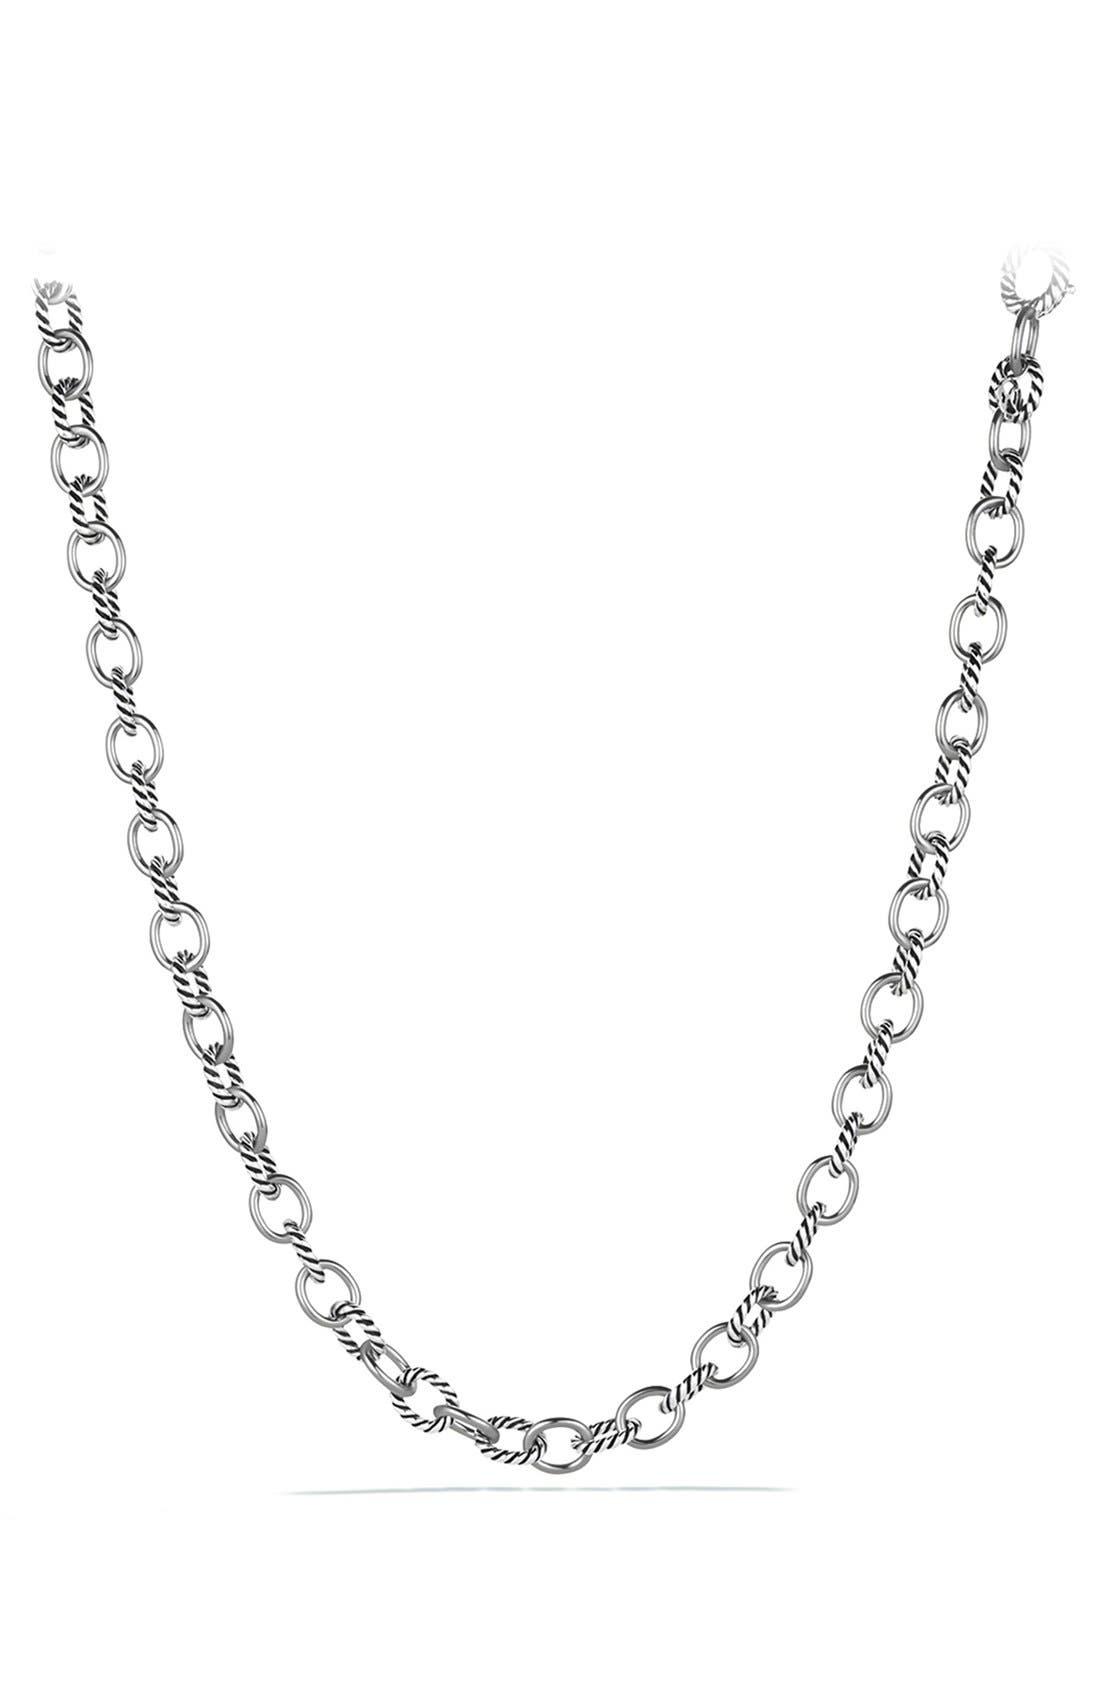 Alternate Image 1 Selected - David Yurman 'Oval' Medium Link Necklace